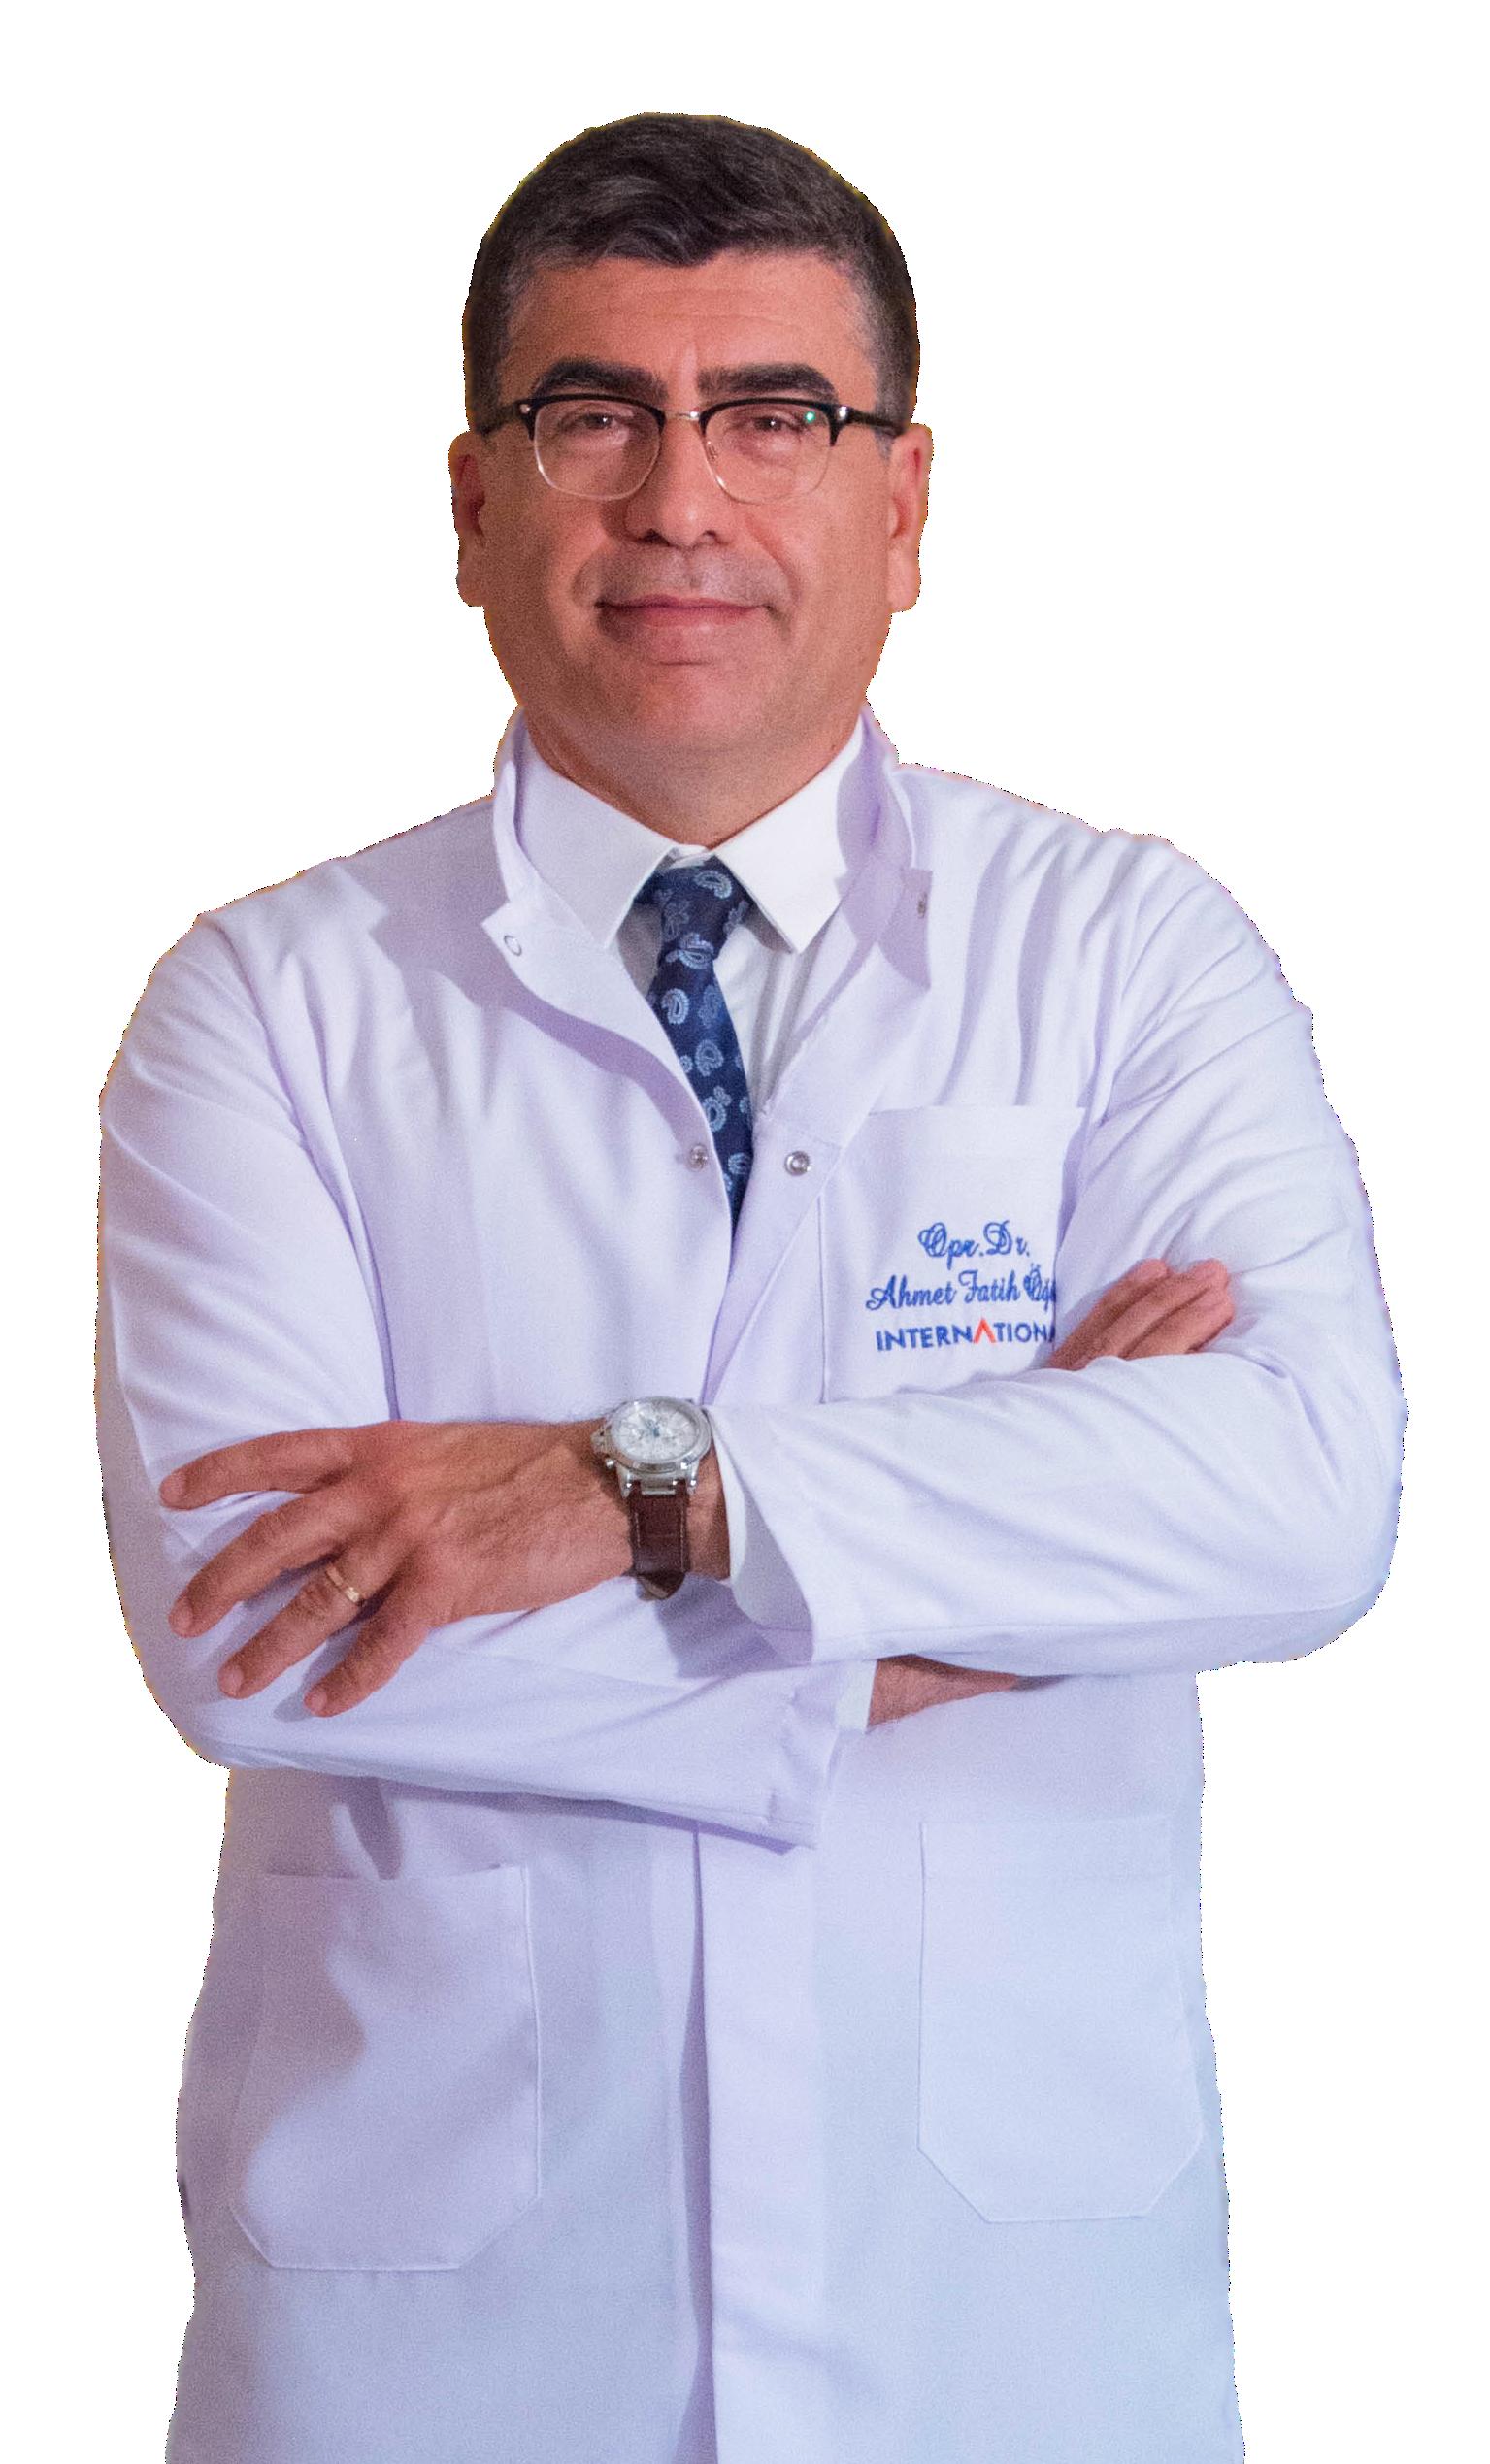 Opr.Dr. Fatih ÖĞÜÇ